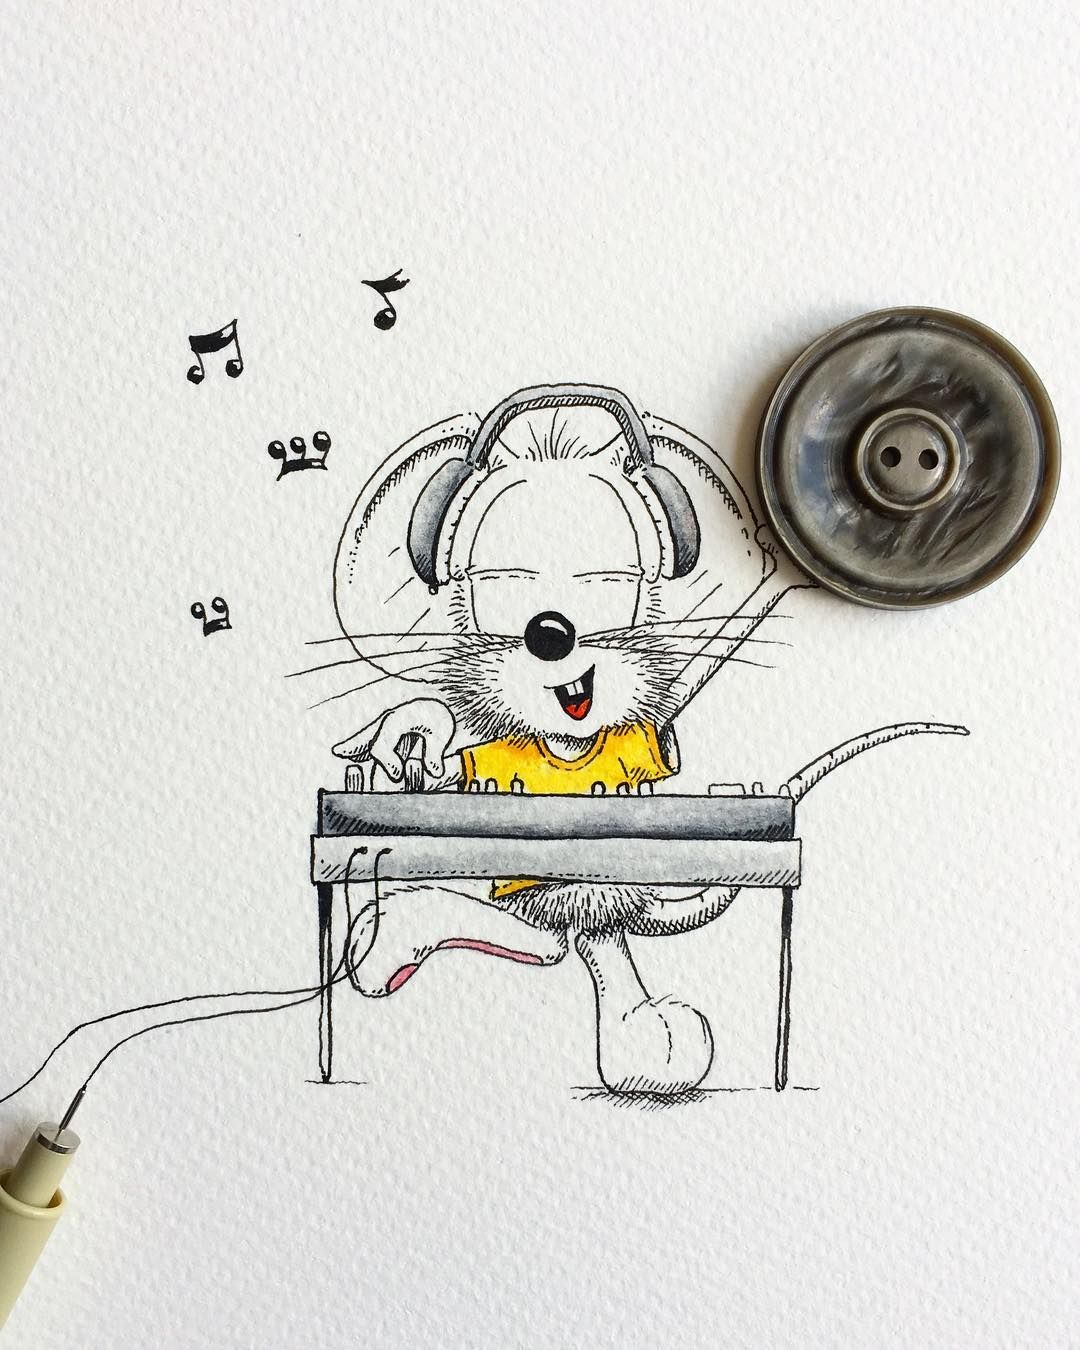 Pin by Mal Mac on Mouse | Cute drawings, Doodles, Drawings